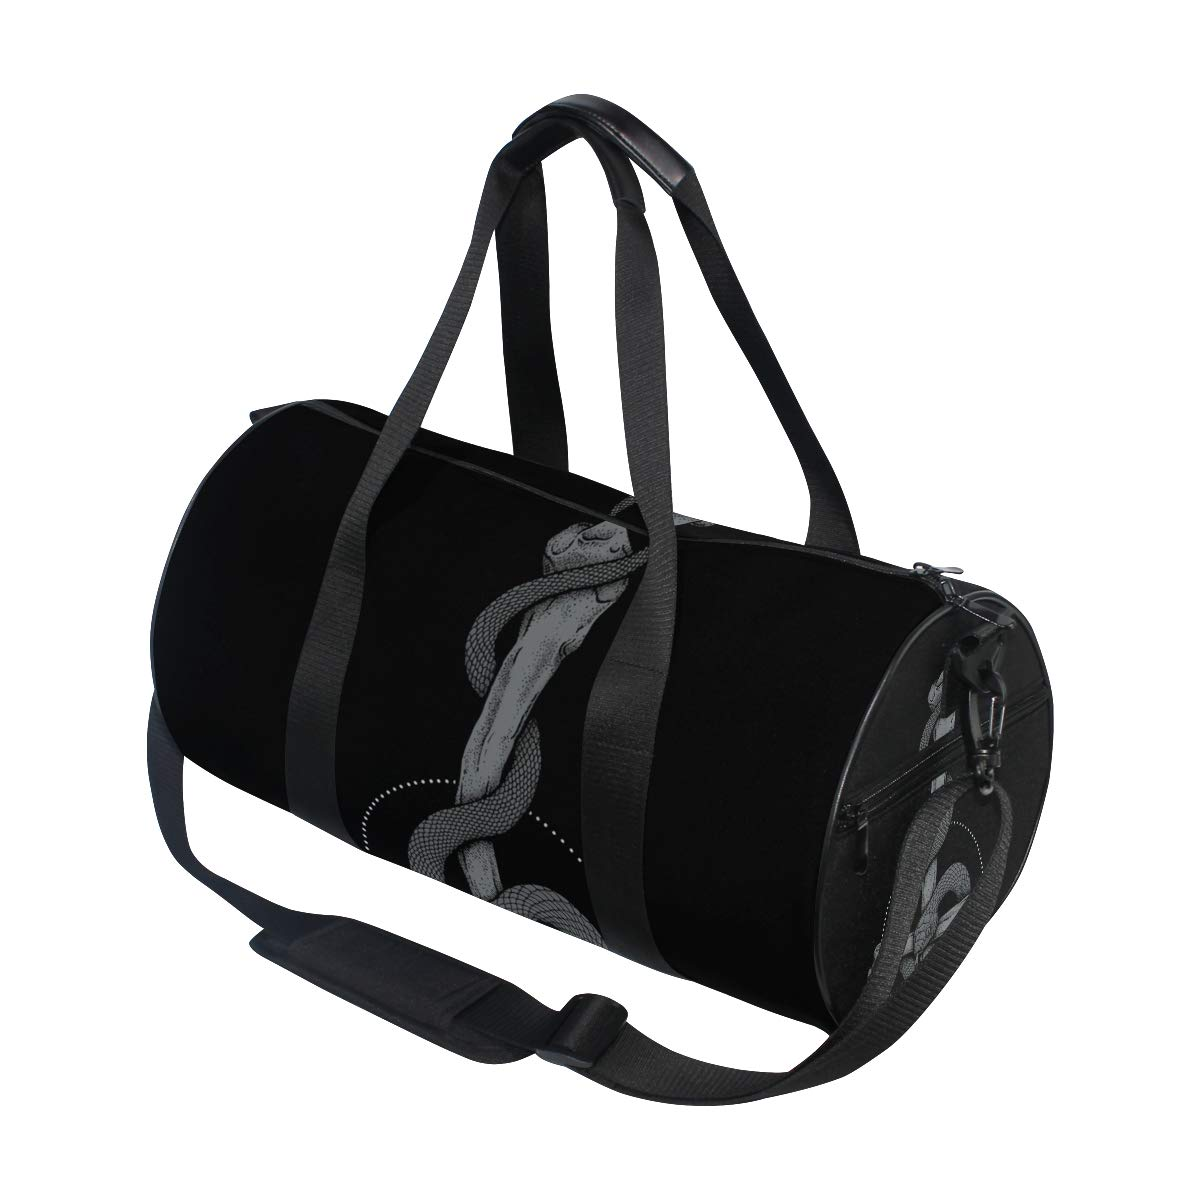 Travel Weekender Duffel Bag for Man and Woman Gym Bag with Snake Sin Bone Print